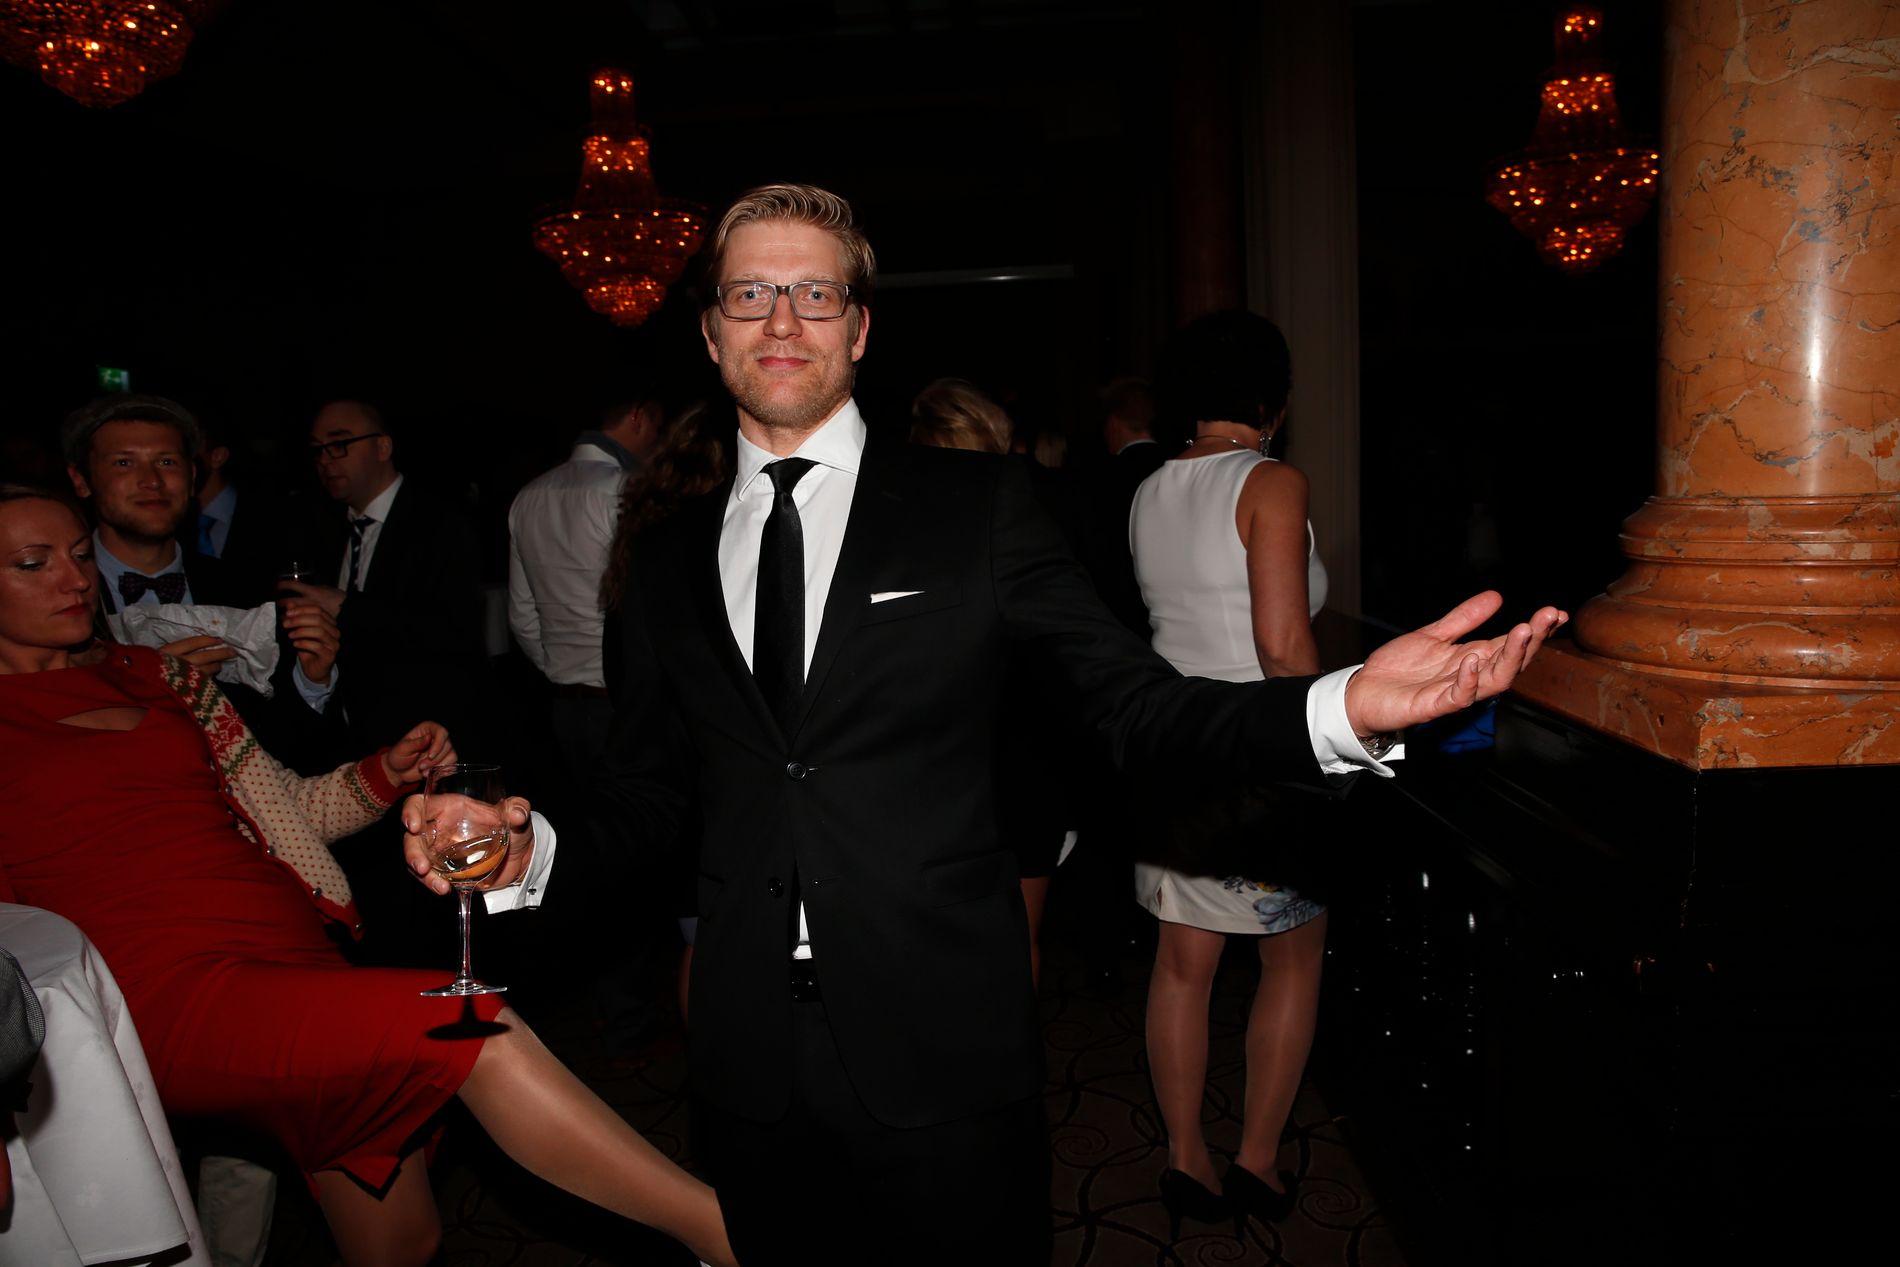 HA DET, HADIA: Kommunikasjonsrådgiver Svein Tore Bergestuen.